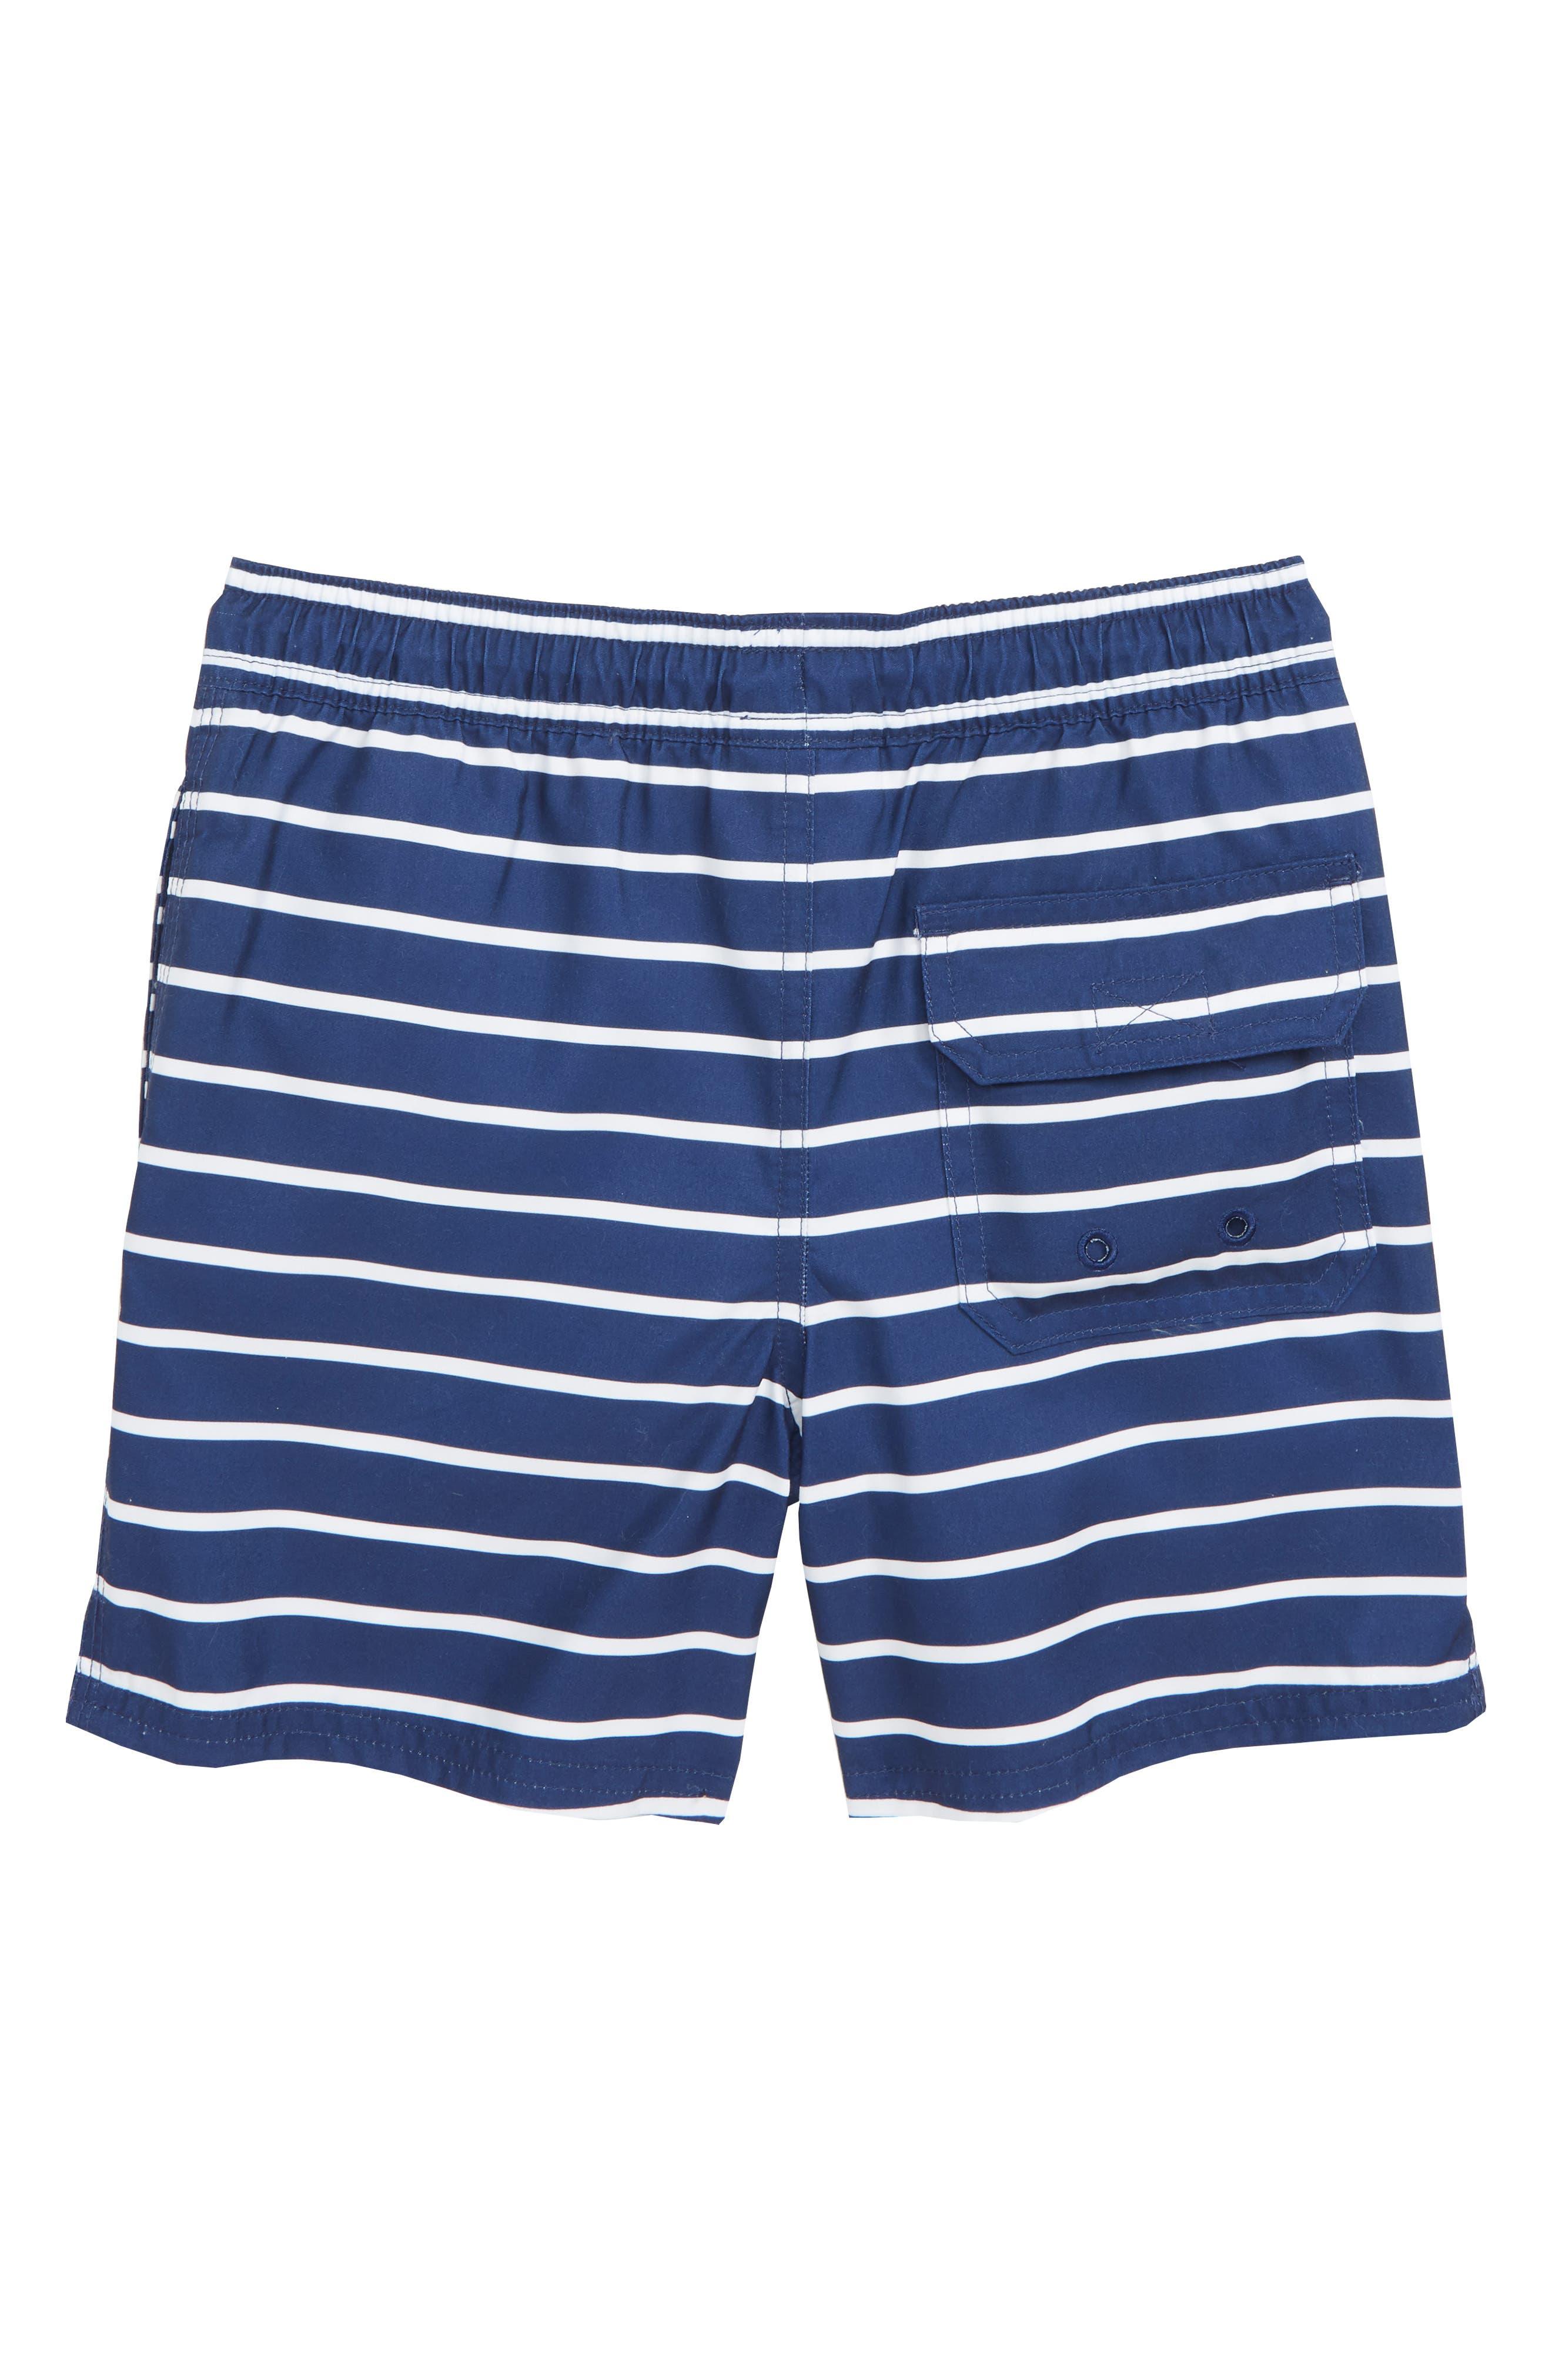 VINEYARD VINES,                             Break Stripe Chappy Swim Trunks,                             Alternate thumbnail 2, color,                             DEEP BAY